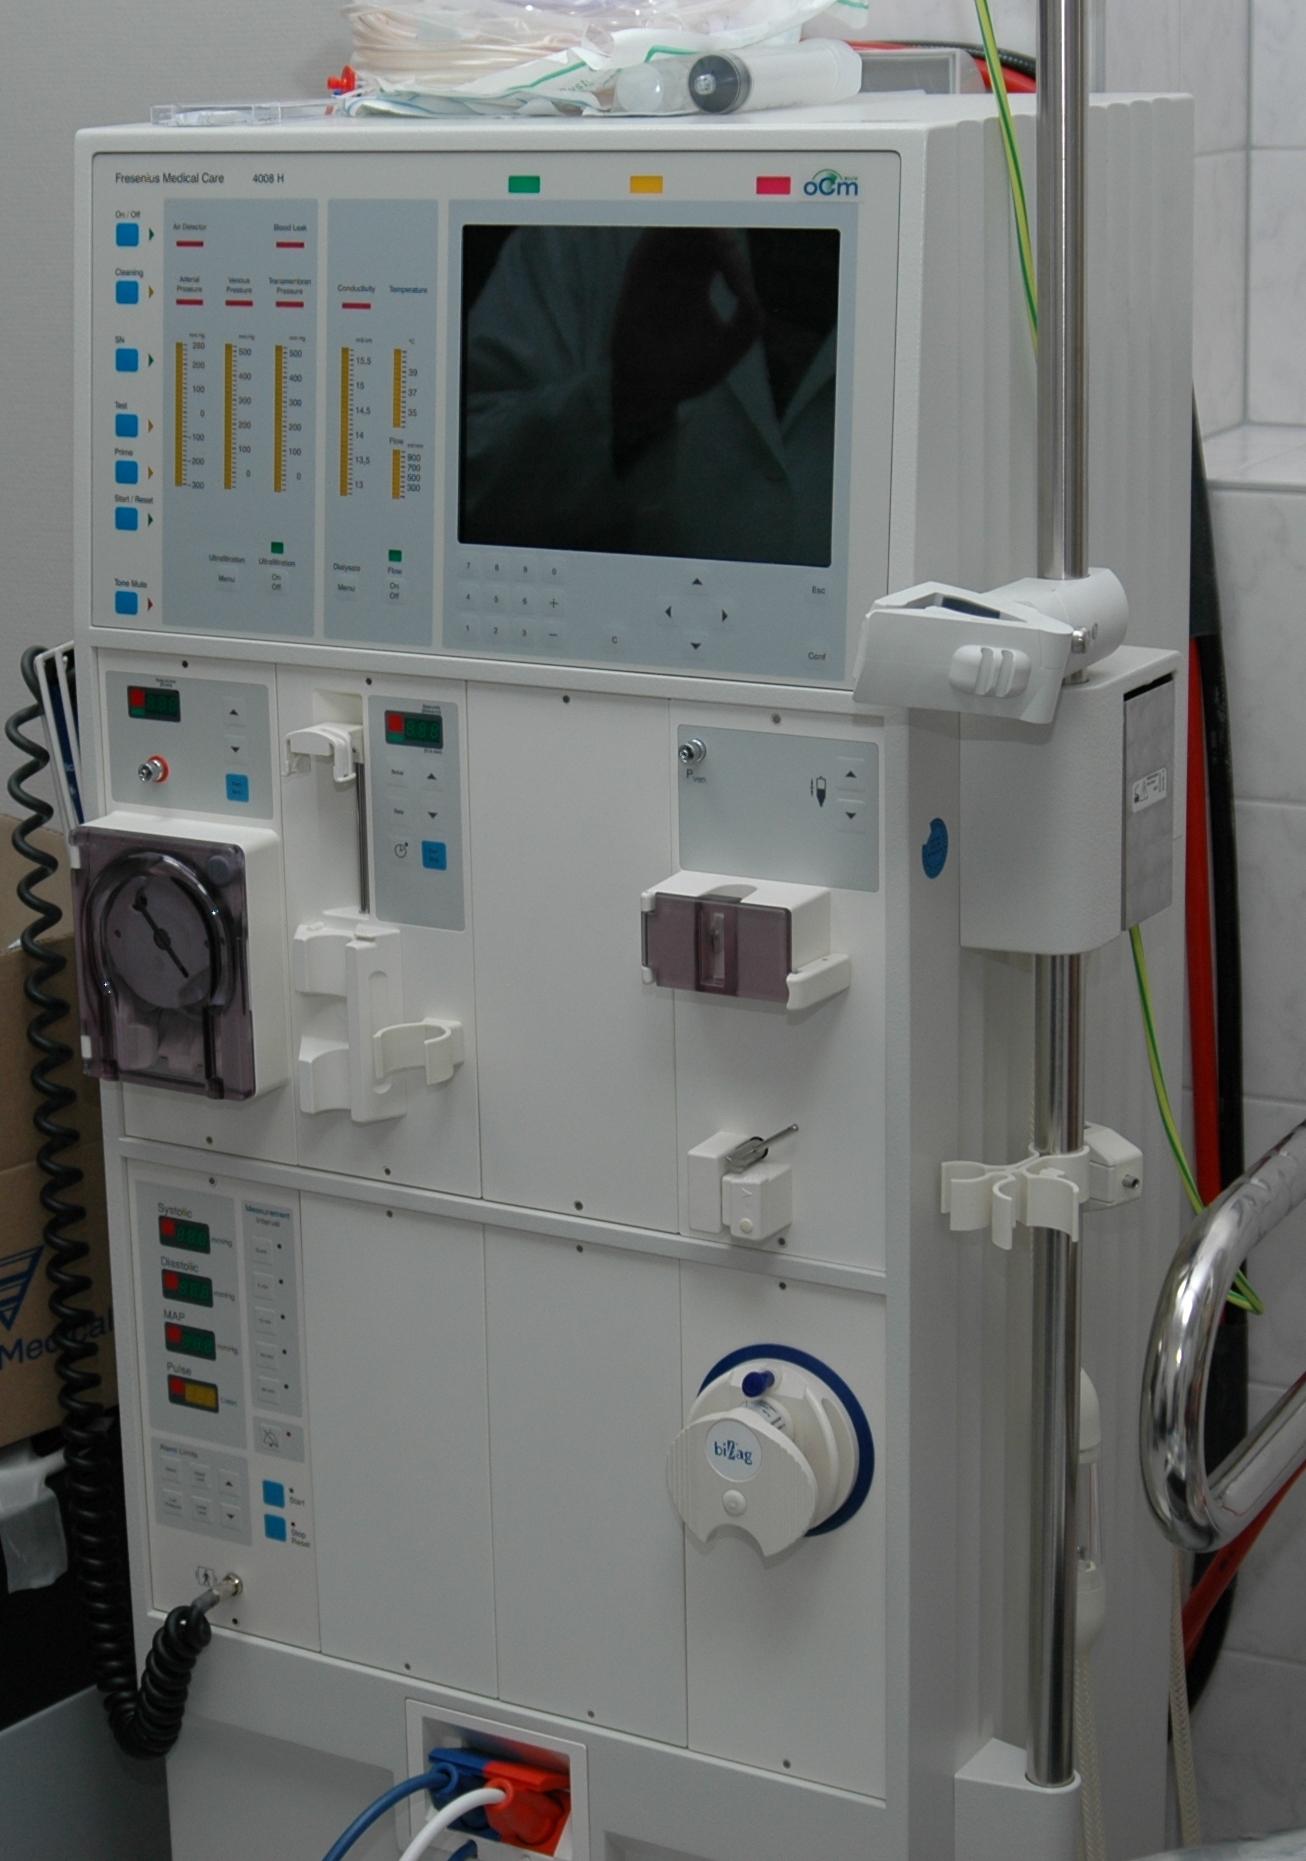 Hemodialysis machine (Photo: Patrick Glanz; Source: Wikipedia)